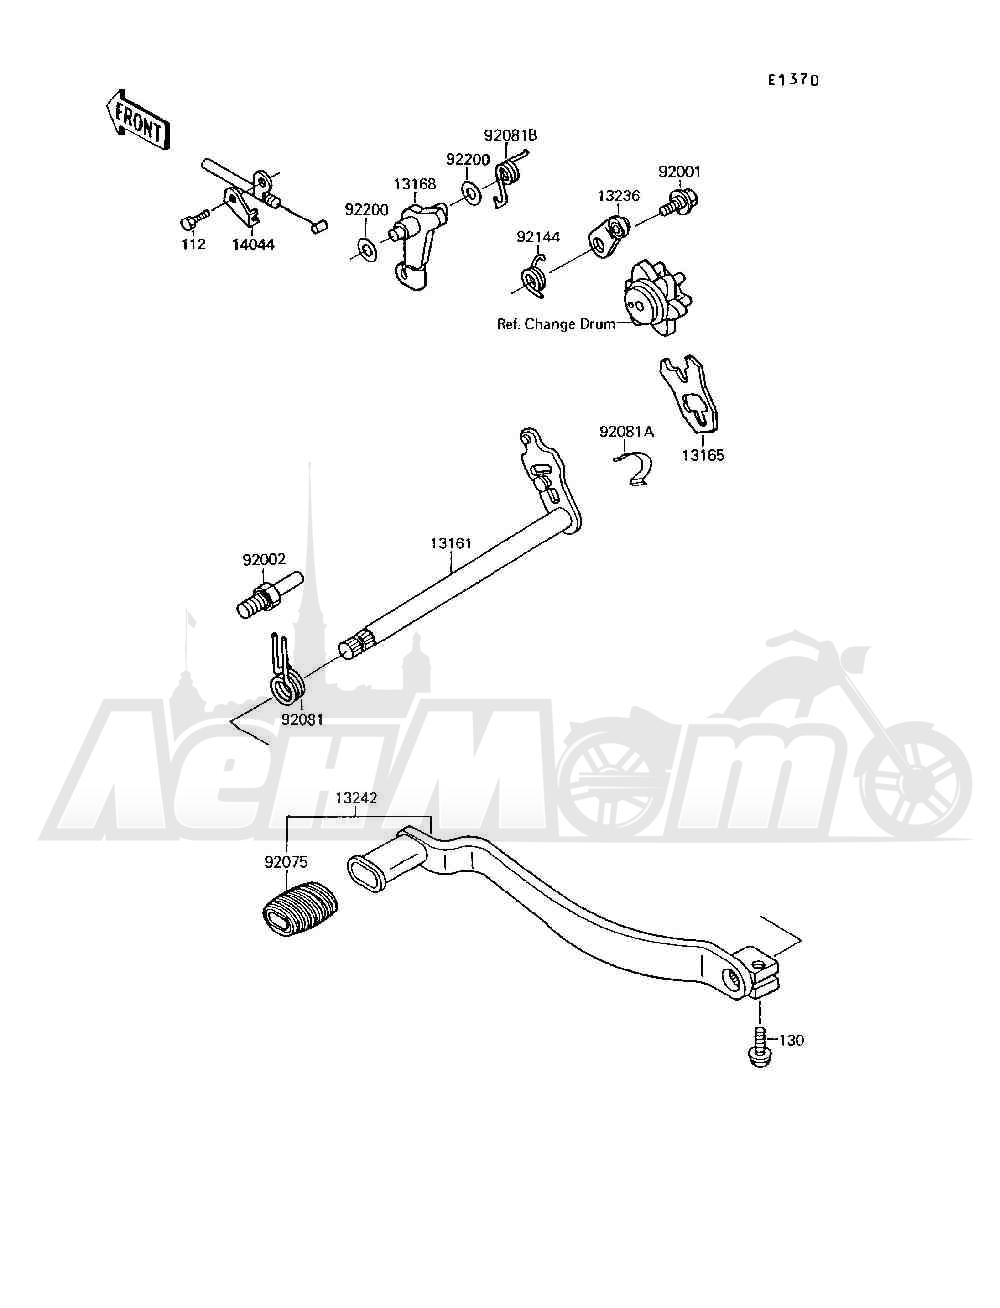 Запчасти для Квадроцикла Kawasaki 1994 MOJAVE 250 (KSF250-A8) Раздел: GEAR CHANGE MECHANISM | переключение передач механизм